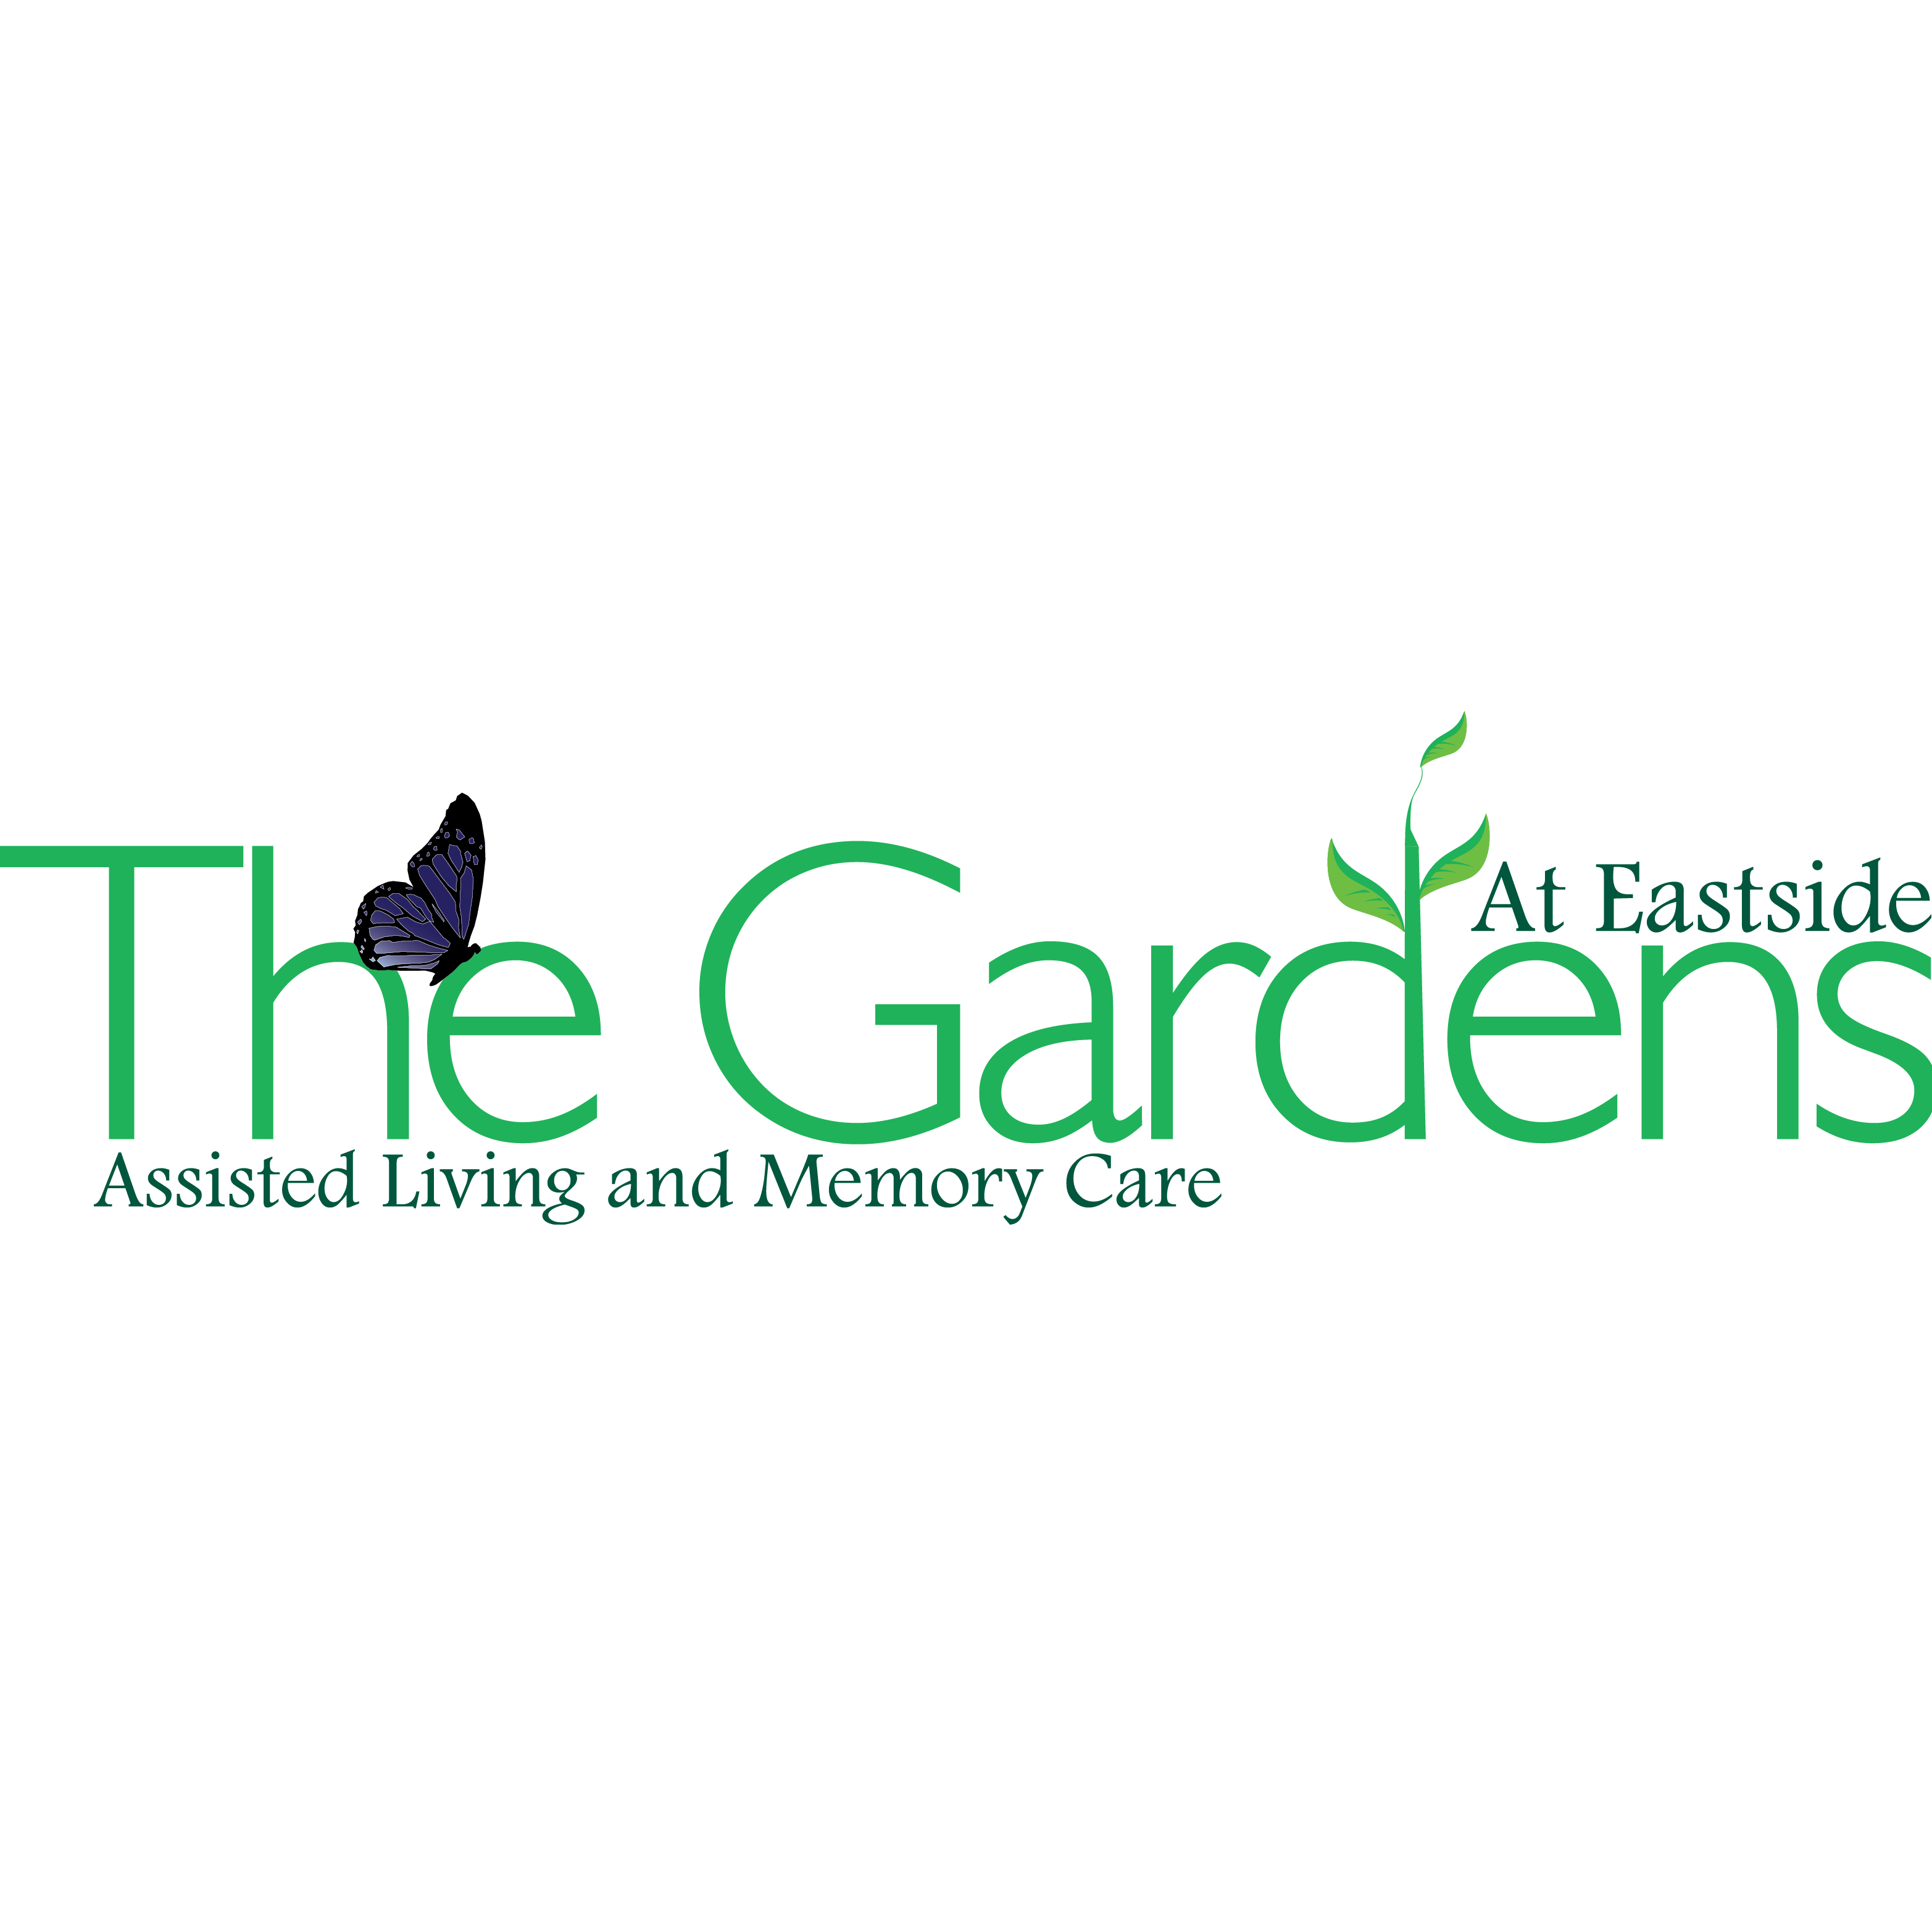 The Gardens at Eastside